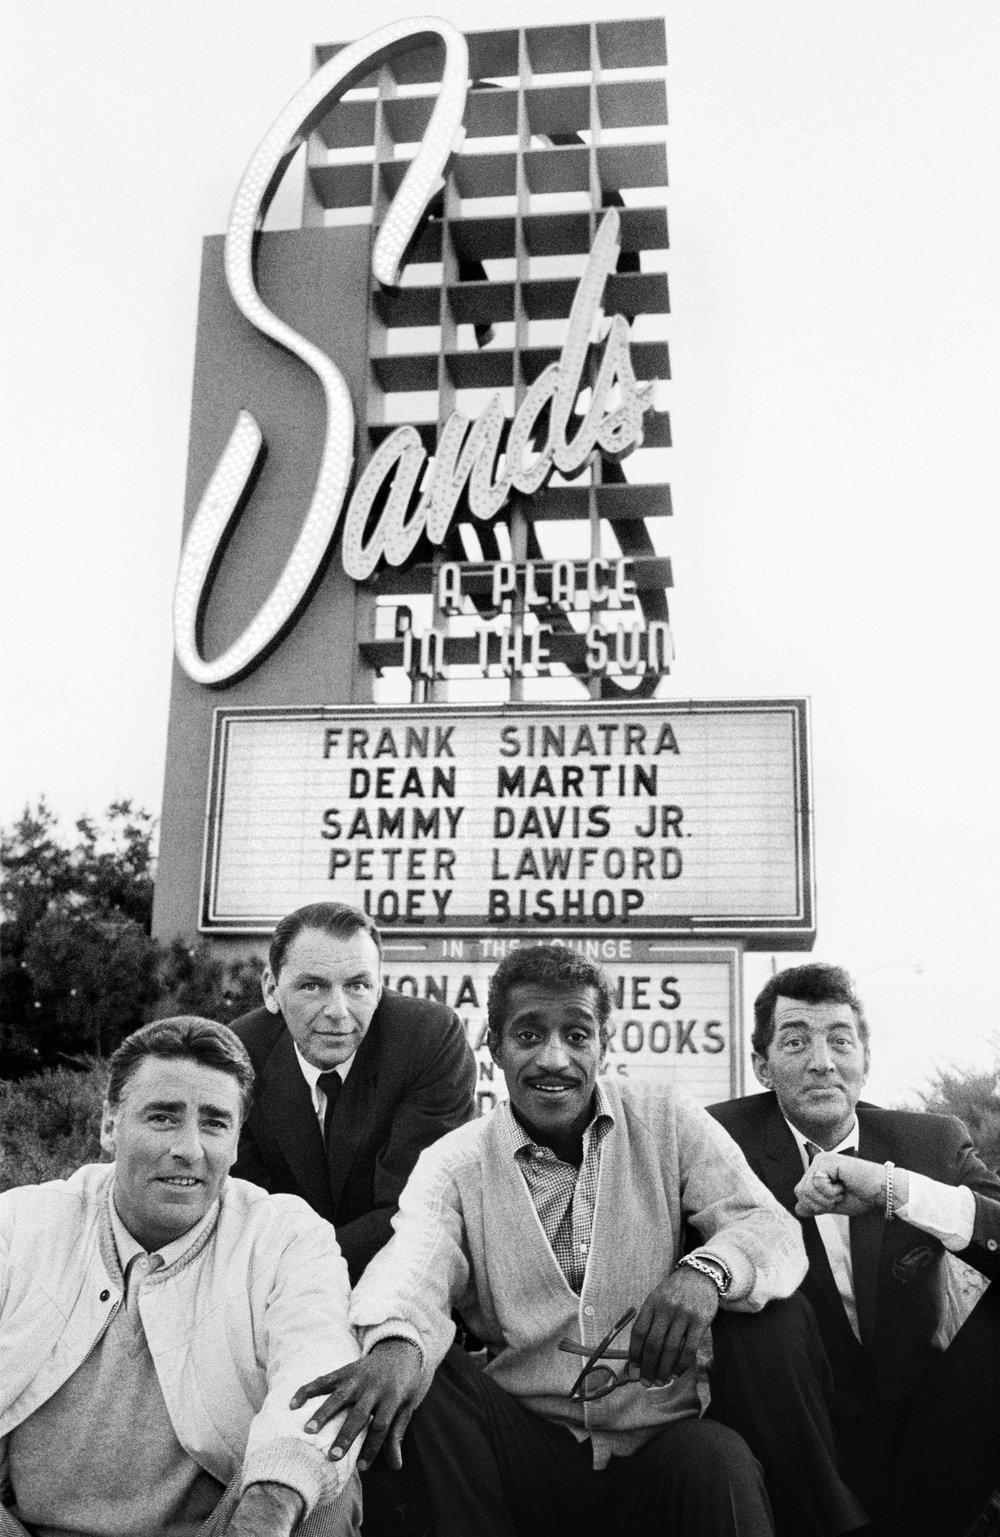 The Rat Pack: Frank Sinatra, Peter Lawford, Sammy Davis Jr., Dean Martin, Sands Hotel whilst filming Ocean's 11, LasVegas, 1960